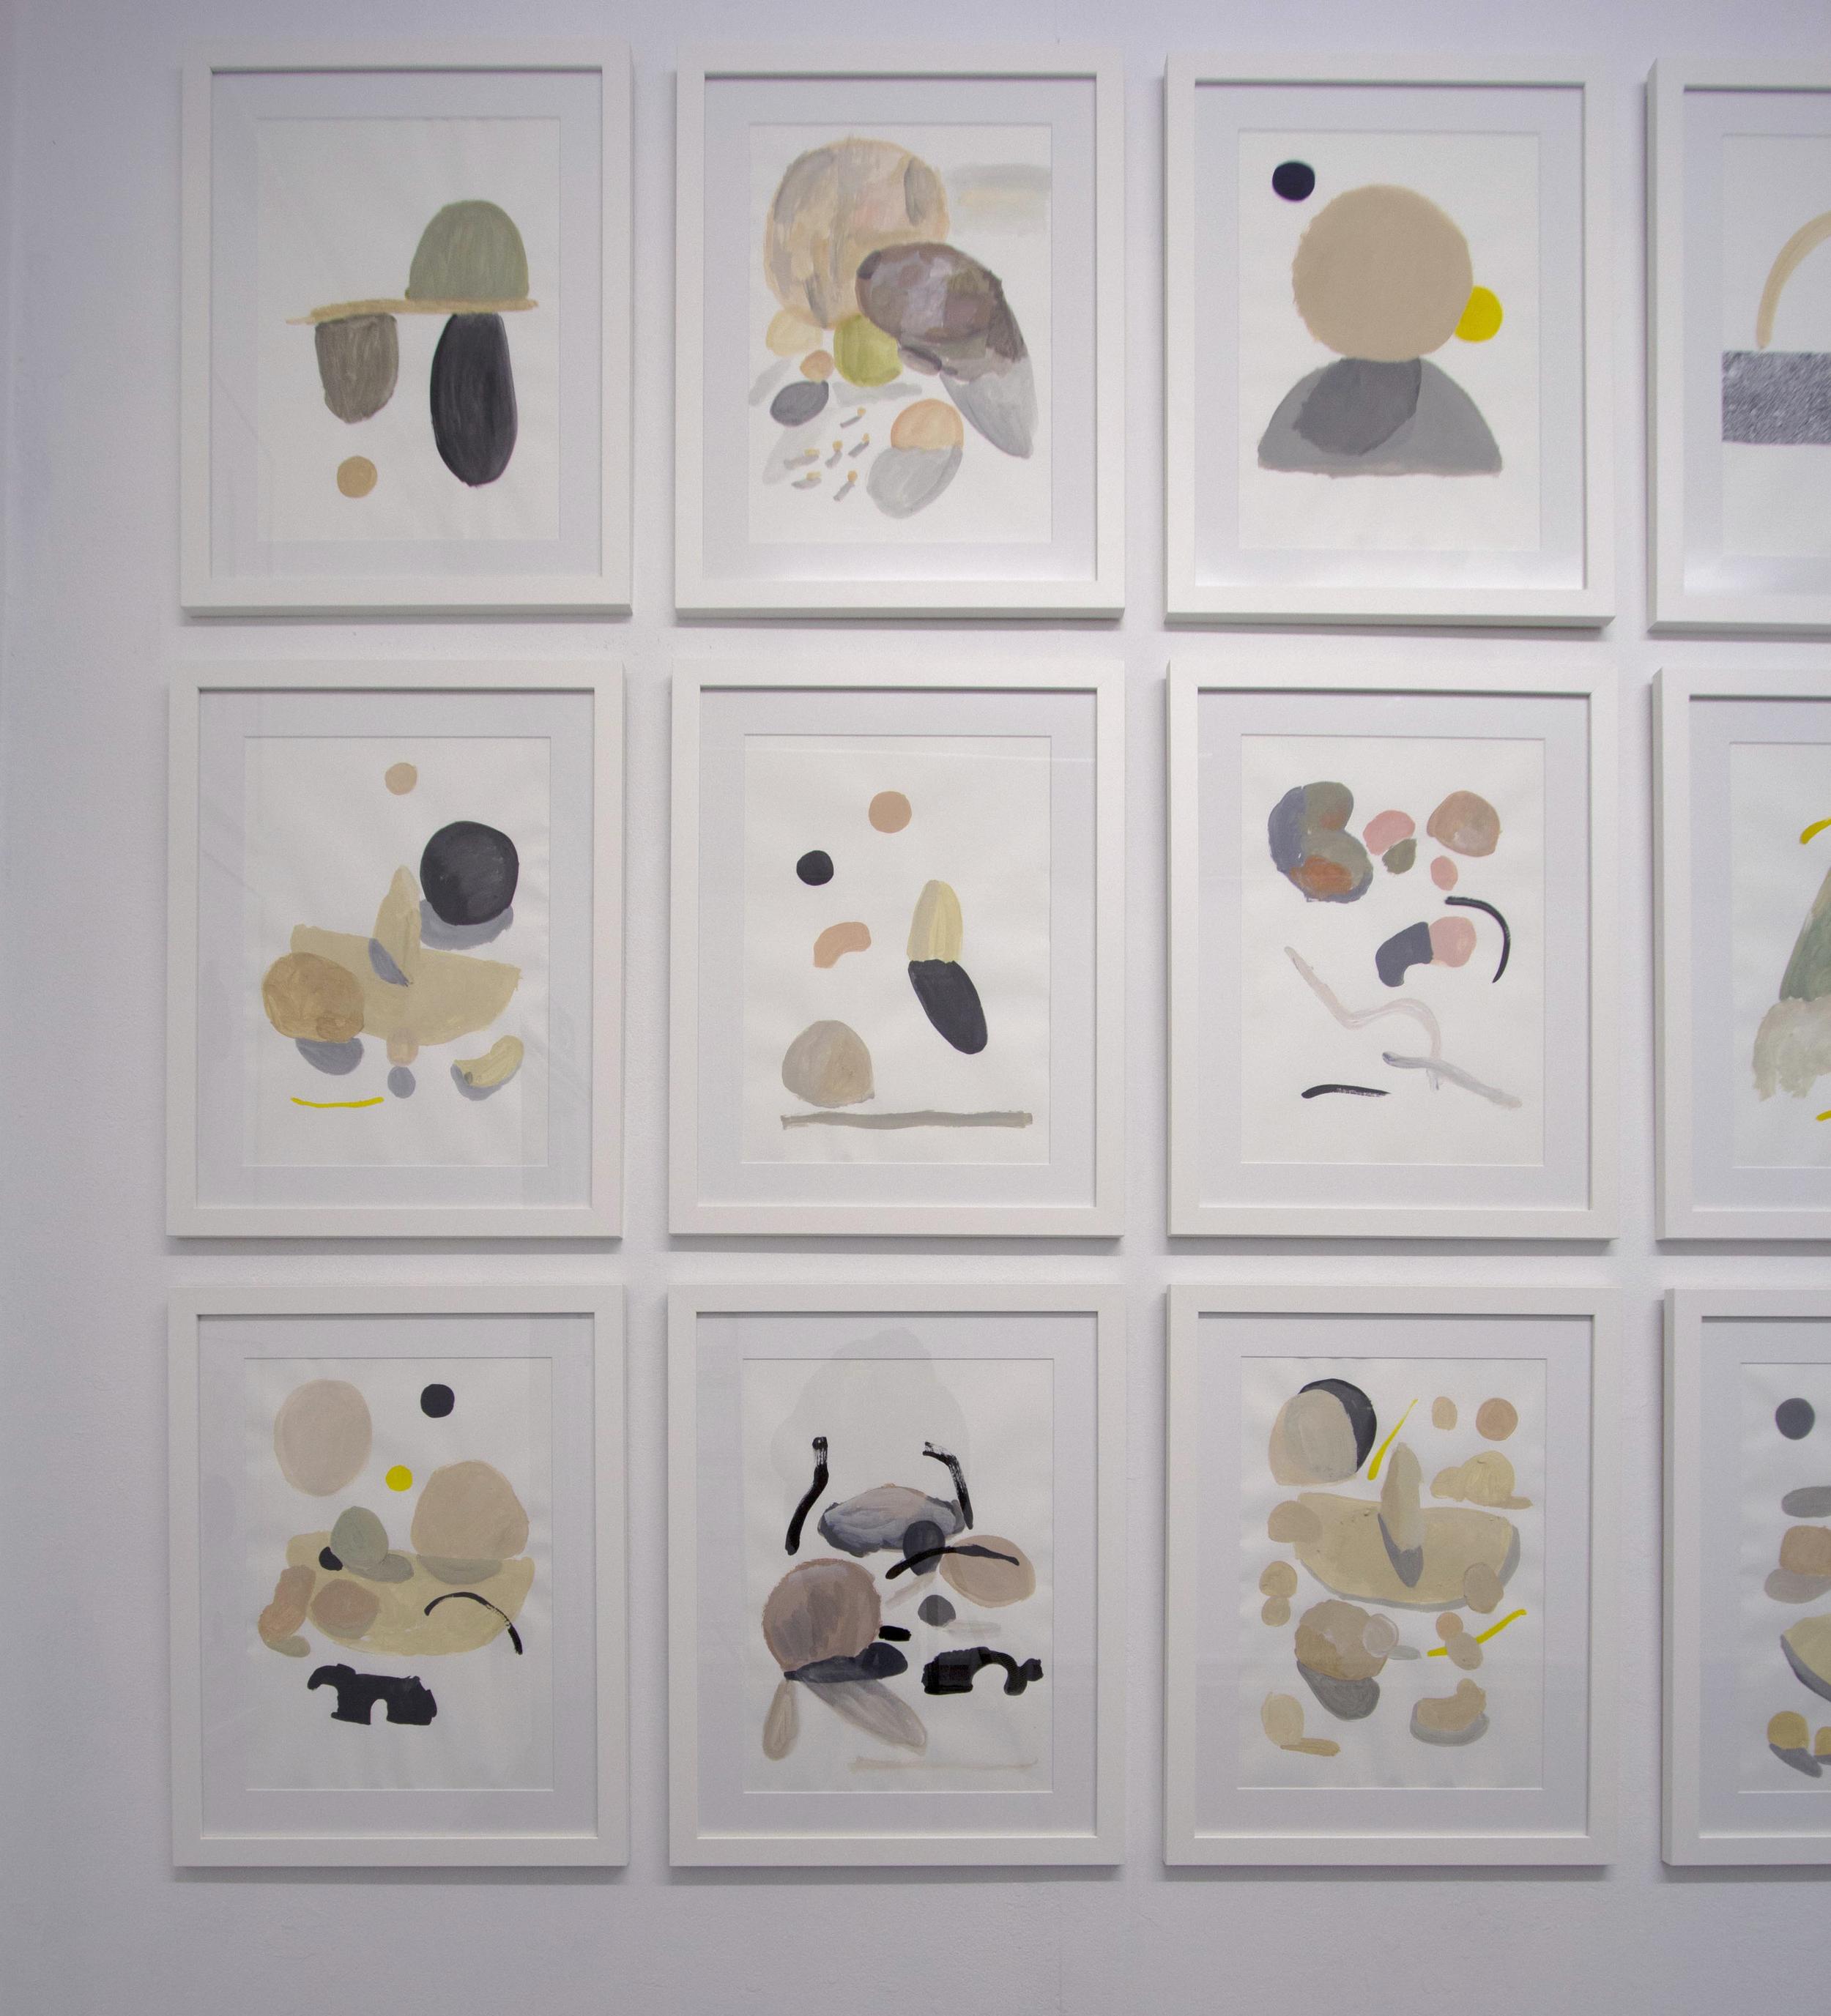 Time Circles installation SEVENTH gallery Eleanor Louise Butt 2014 IX WEB copy.jpg